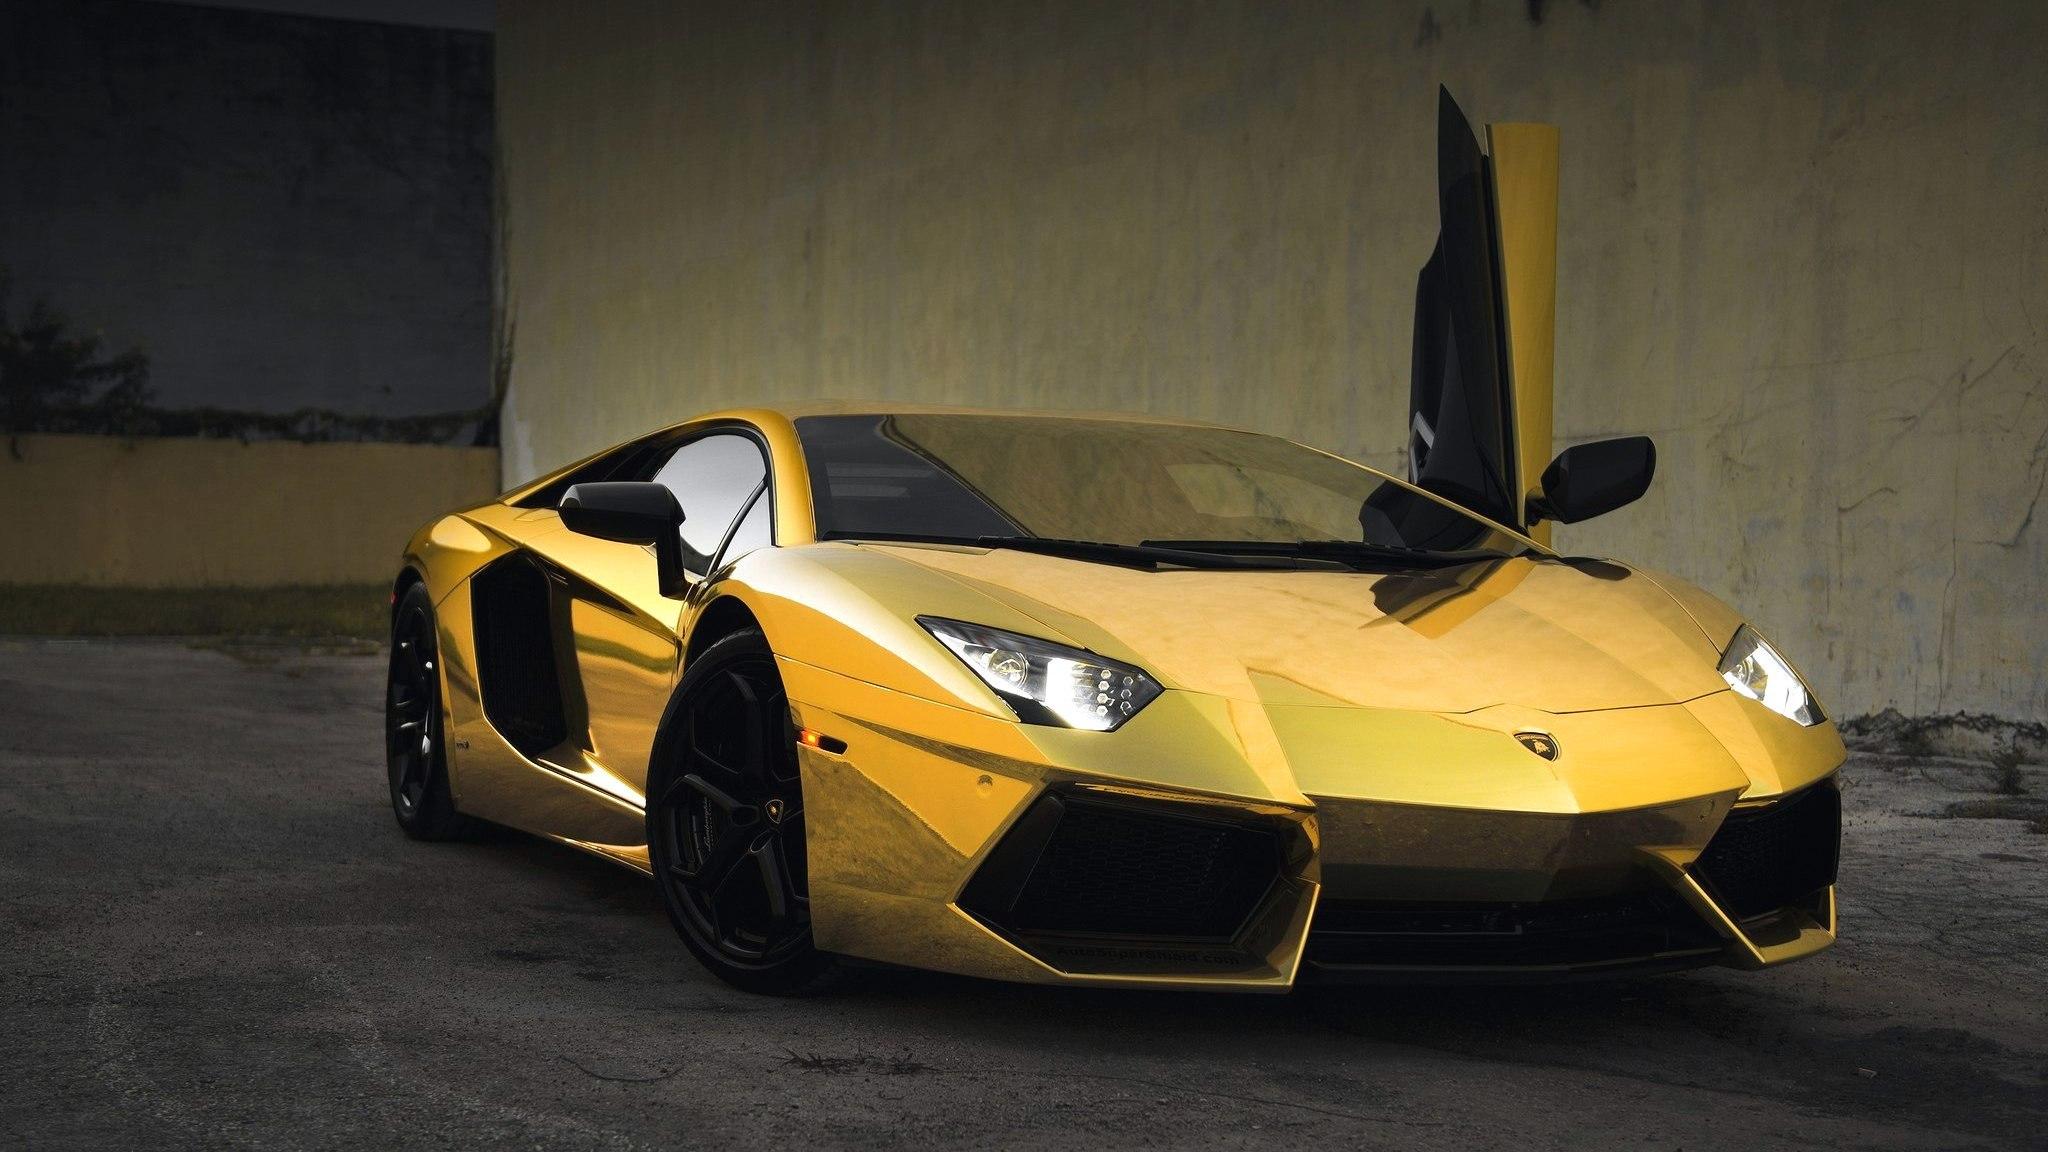 Wallpaper Beautiful Cars And Luxury With Car Hd Goldan (#547296 ...